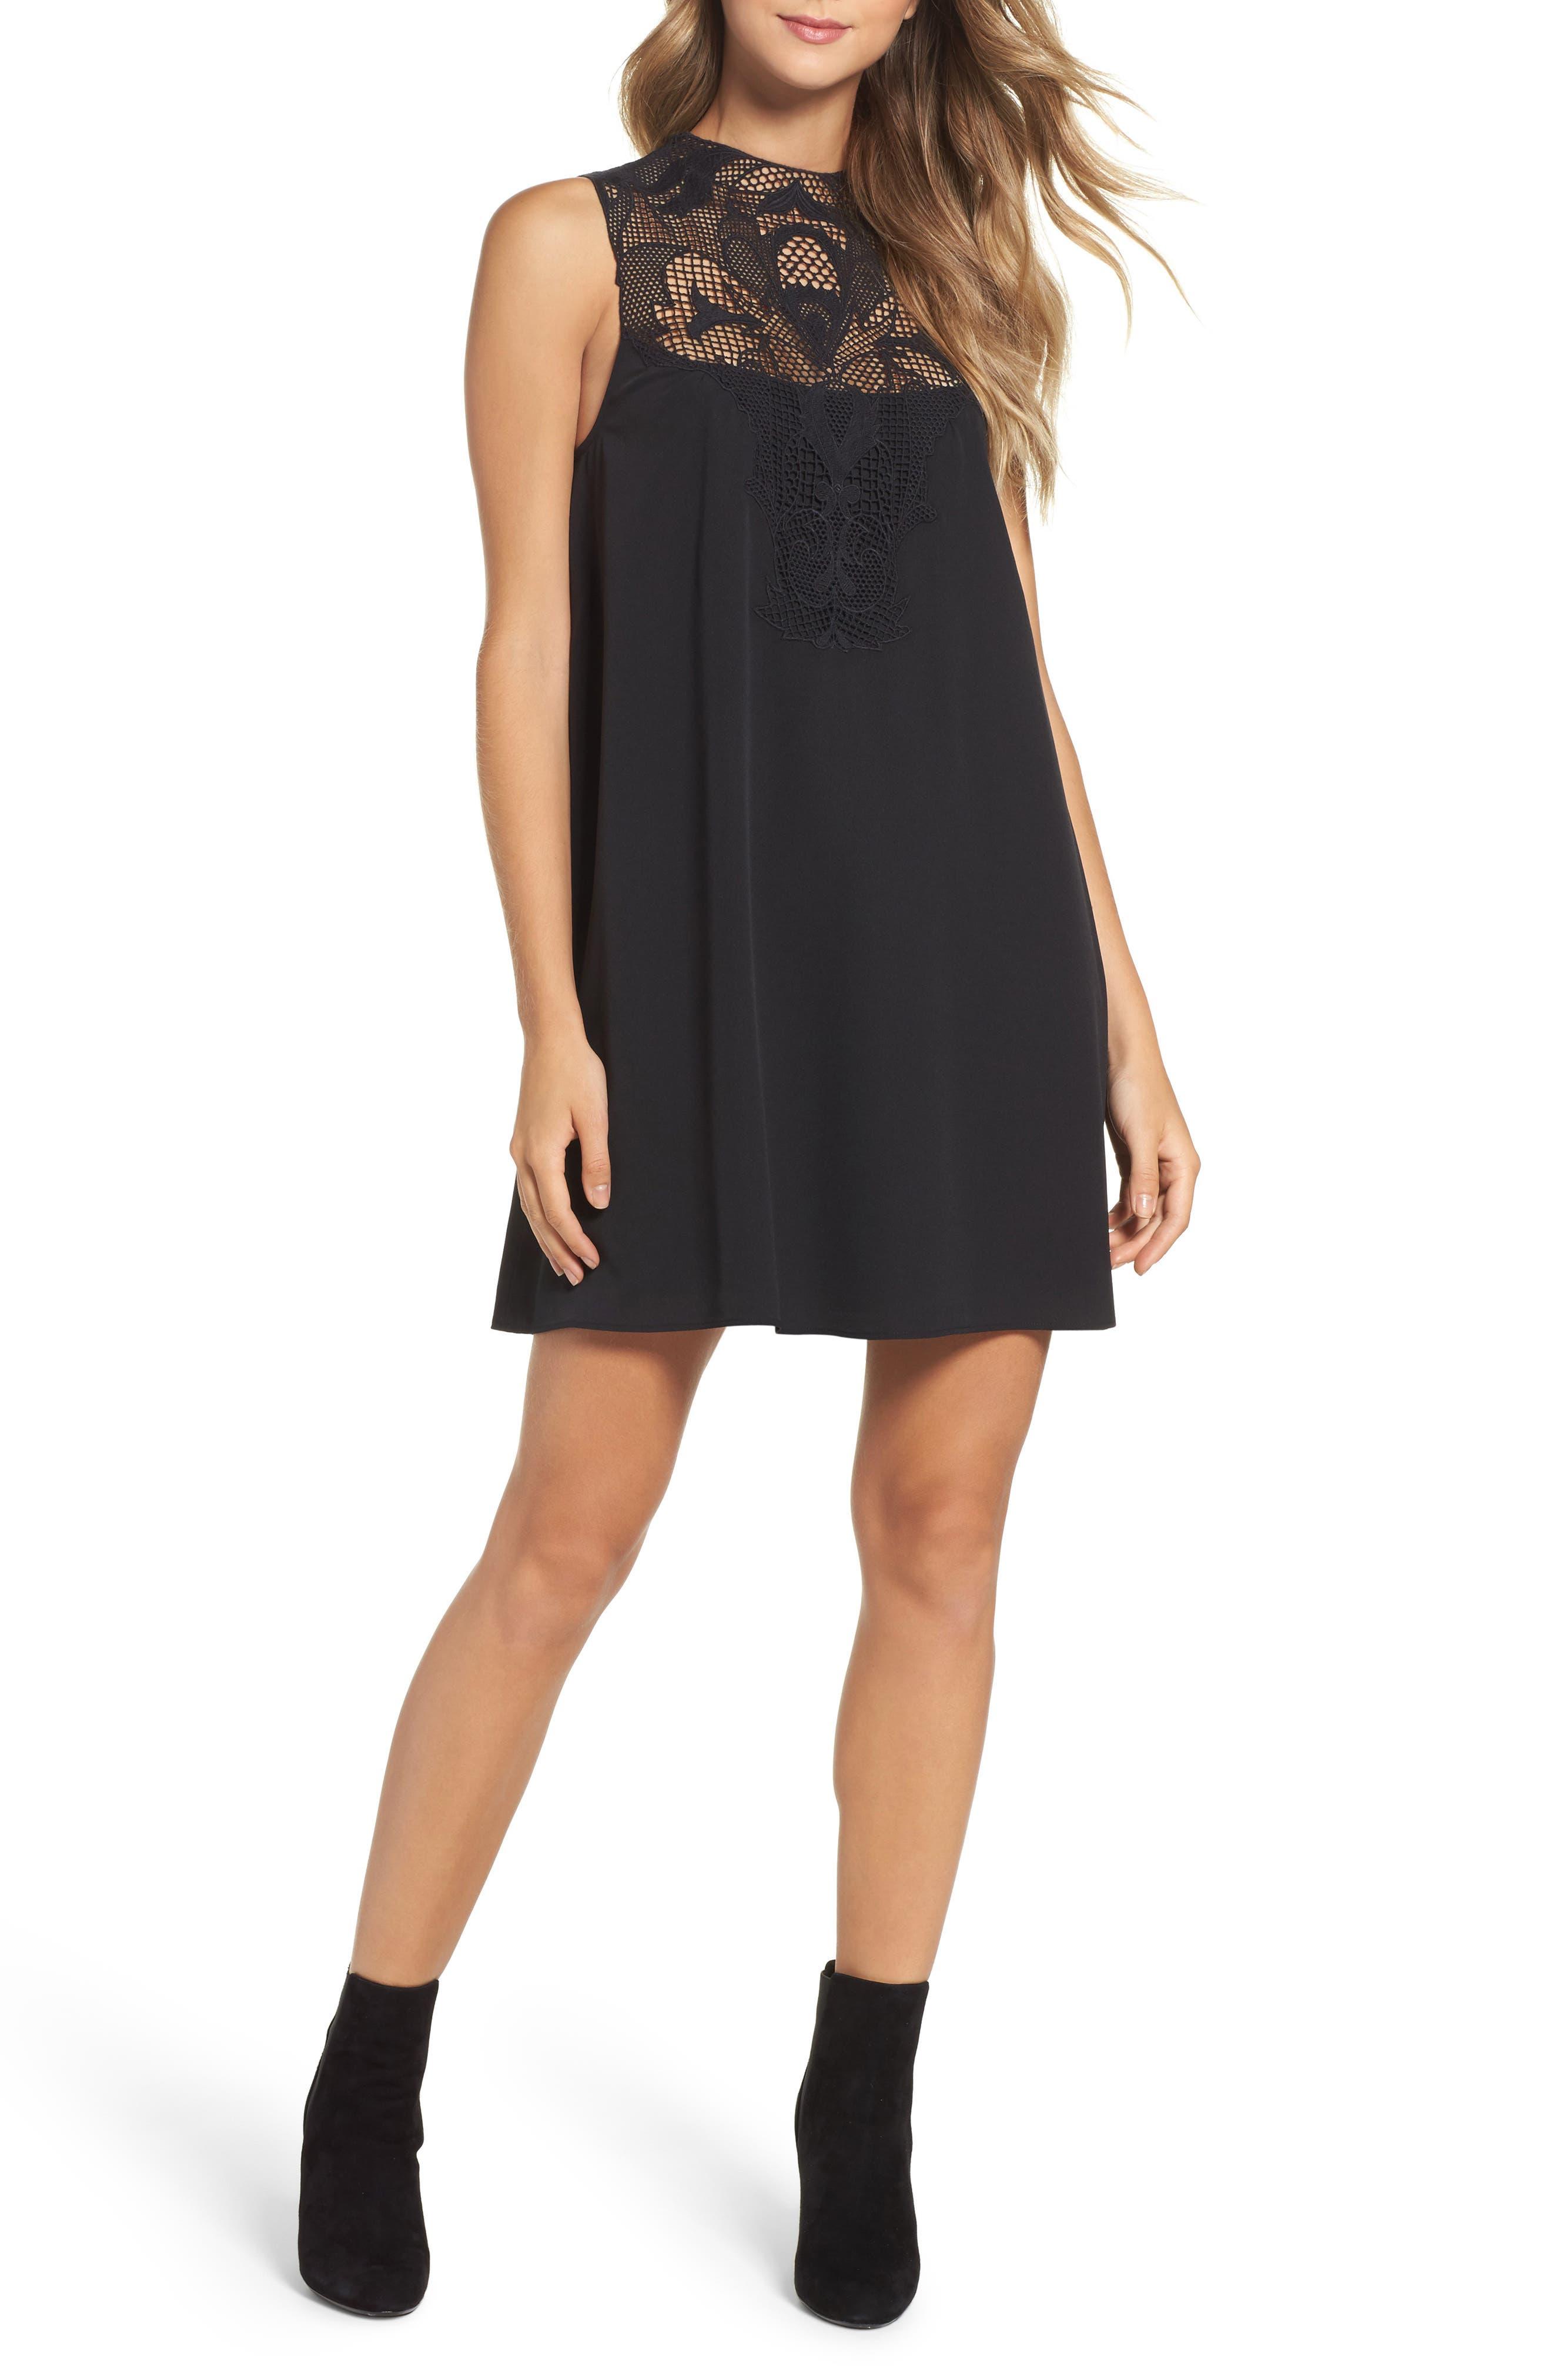 Alternate Image 1 Selected - Chelsea28 Swing Dress